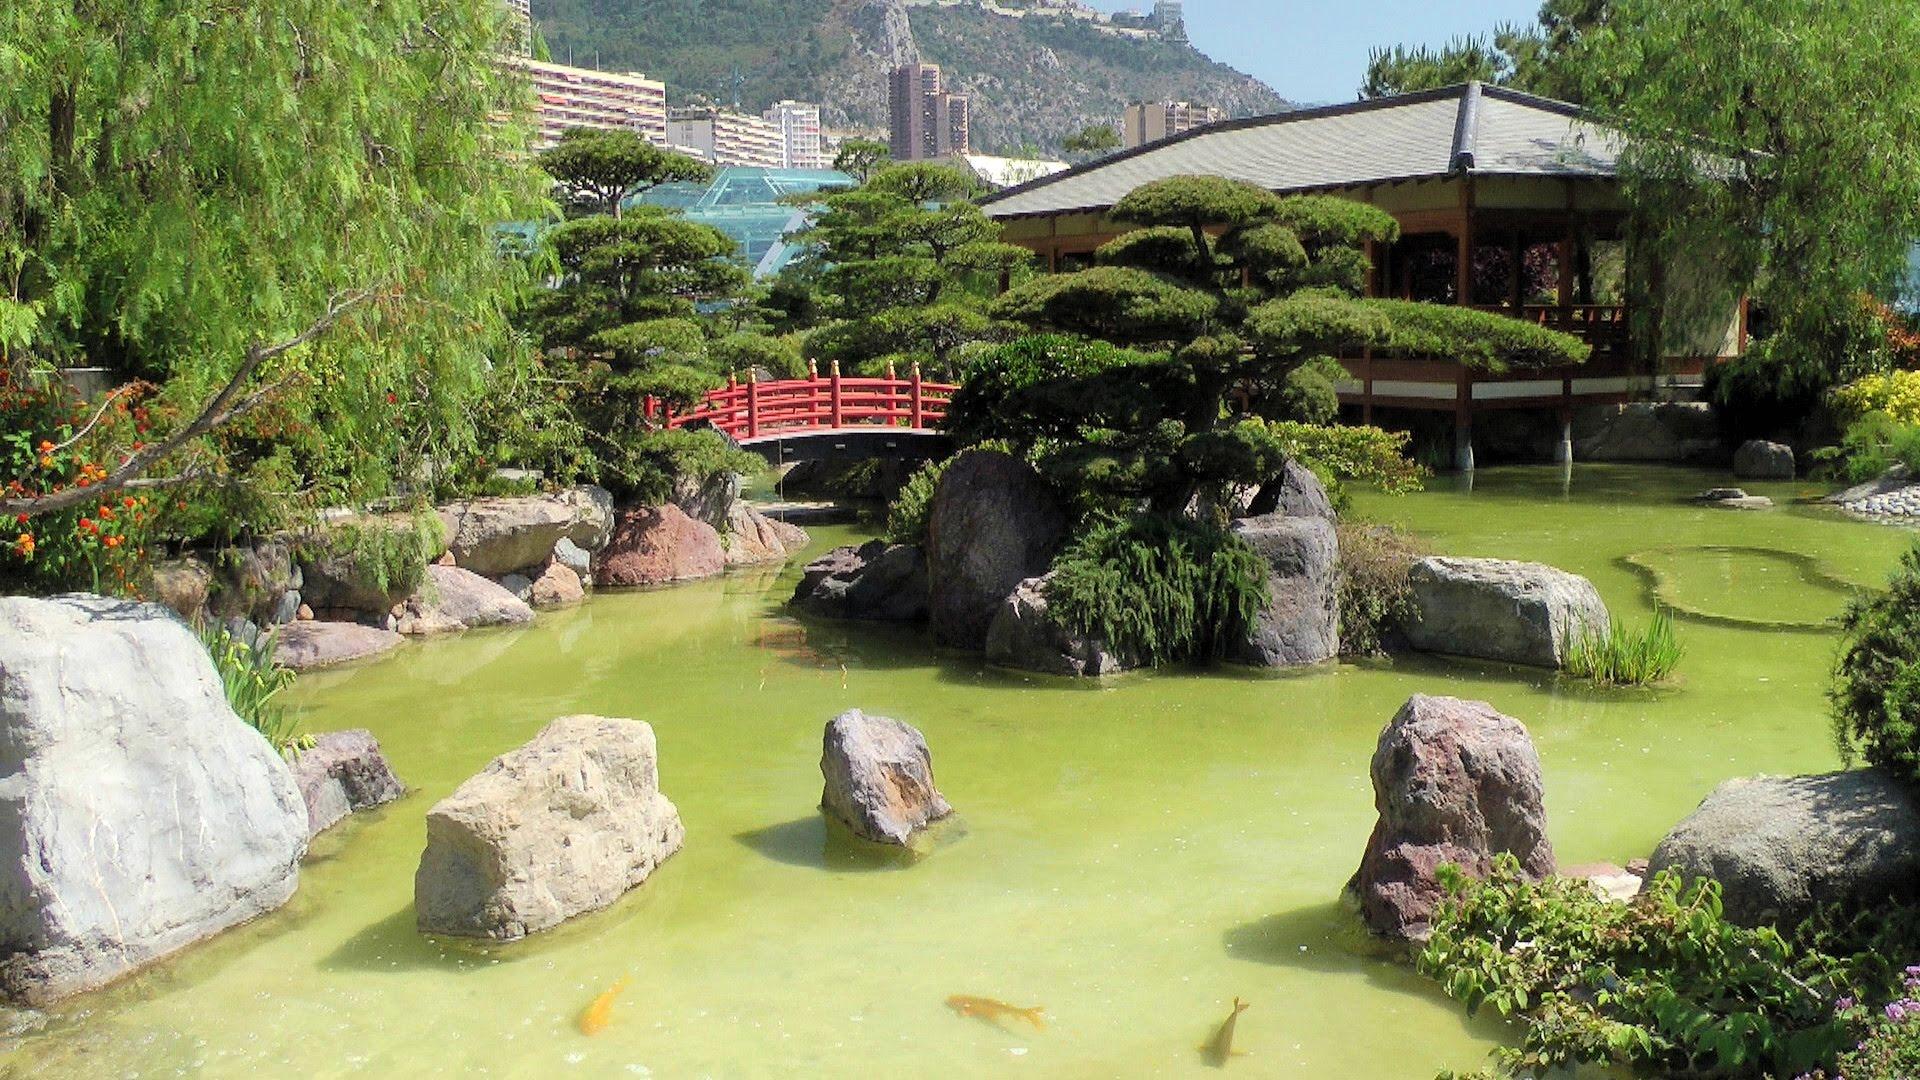 Jard n japon s de m naco viajar a m naco for Jardin japones 2016